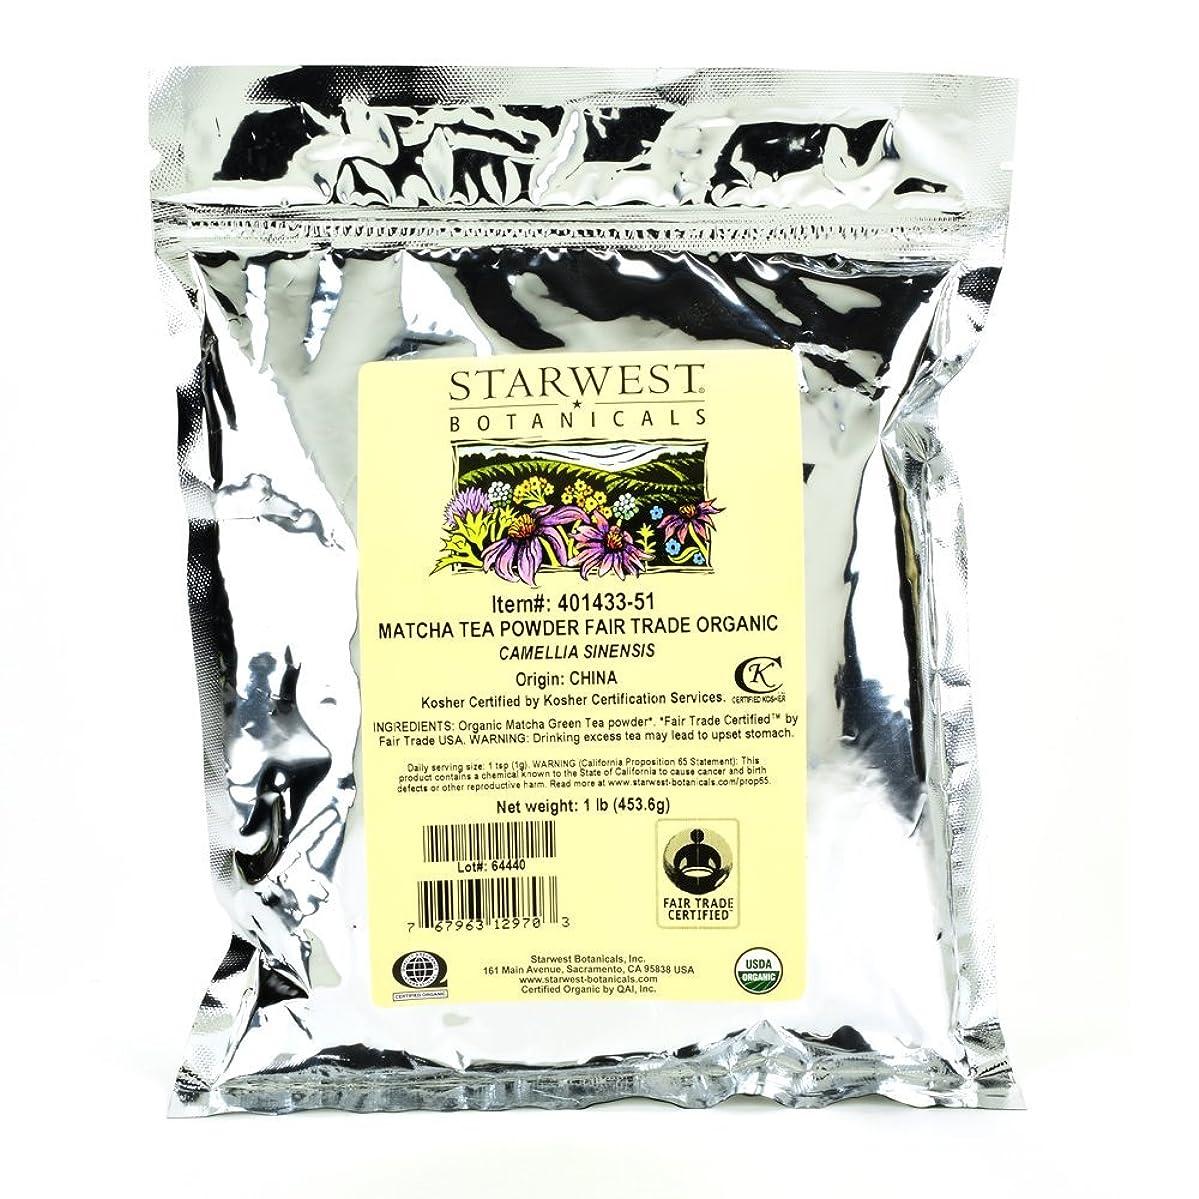 Starwest Botanicals Organic Matcha Tea Powder Fair Trade, 1 Pound